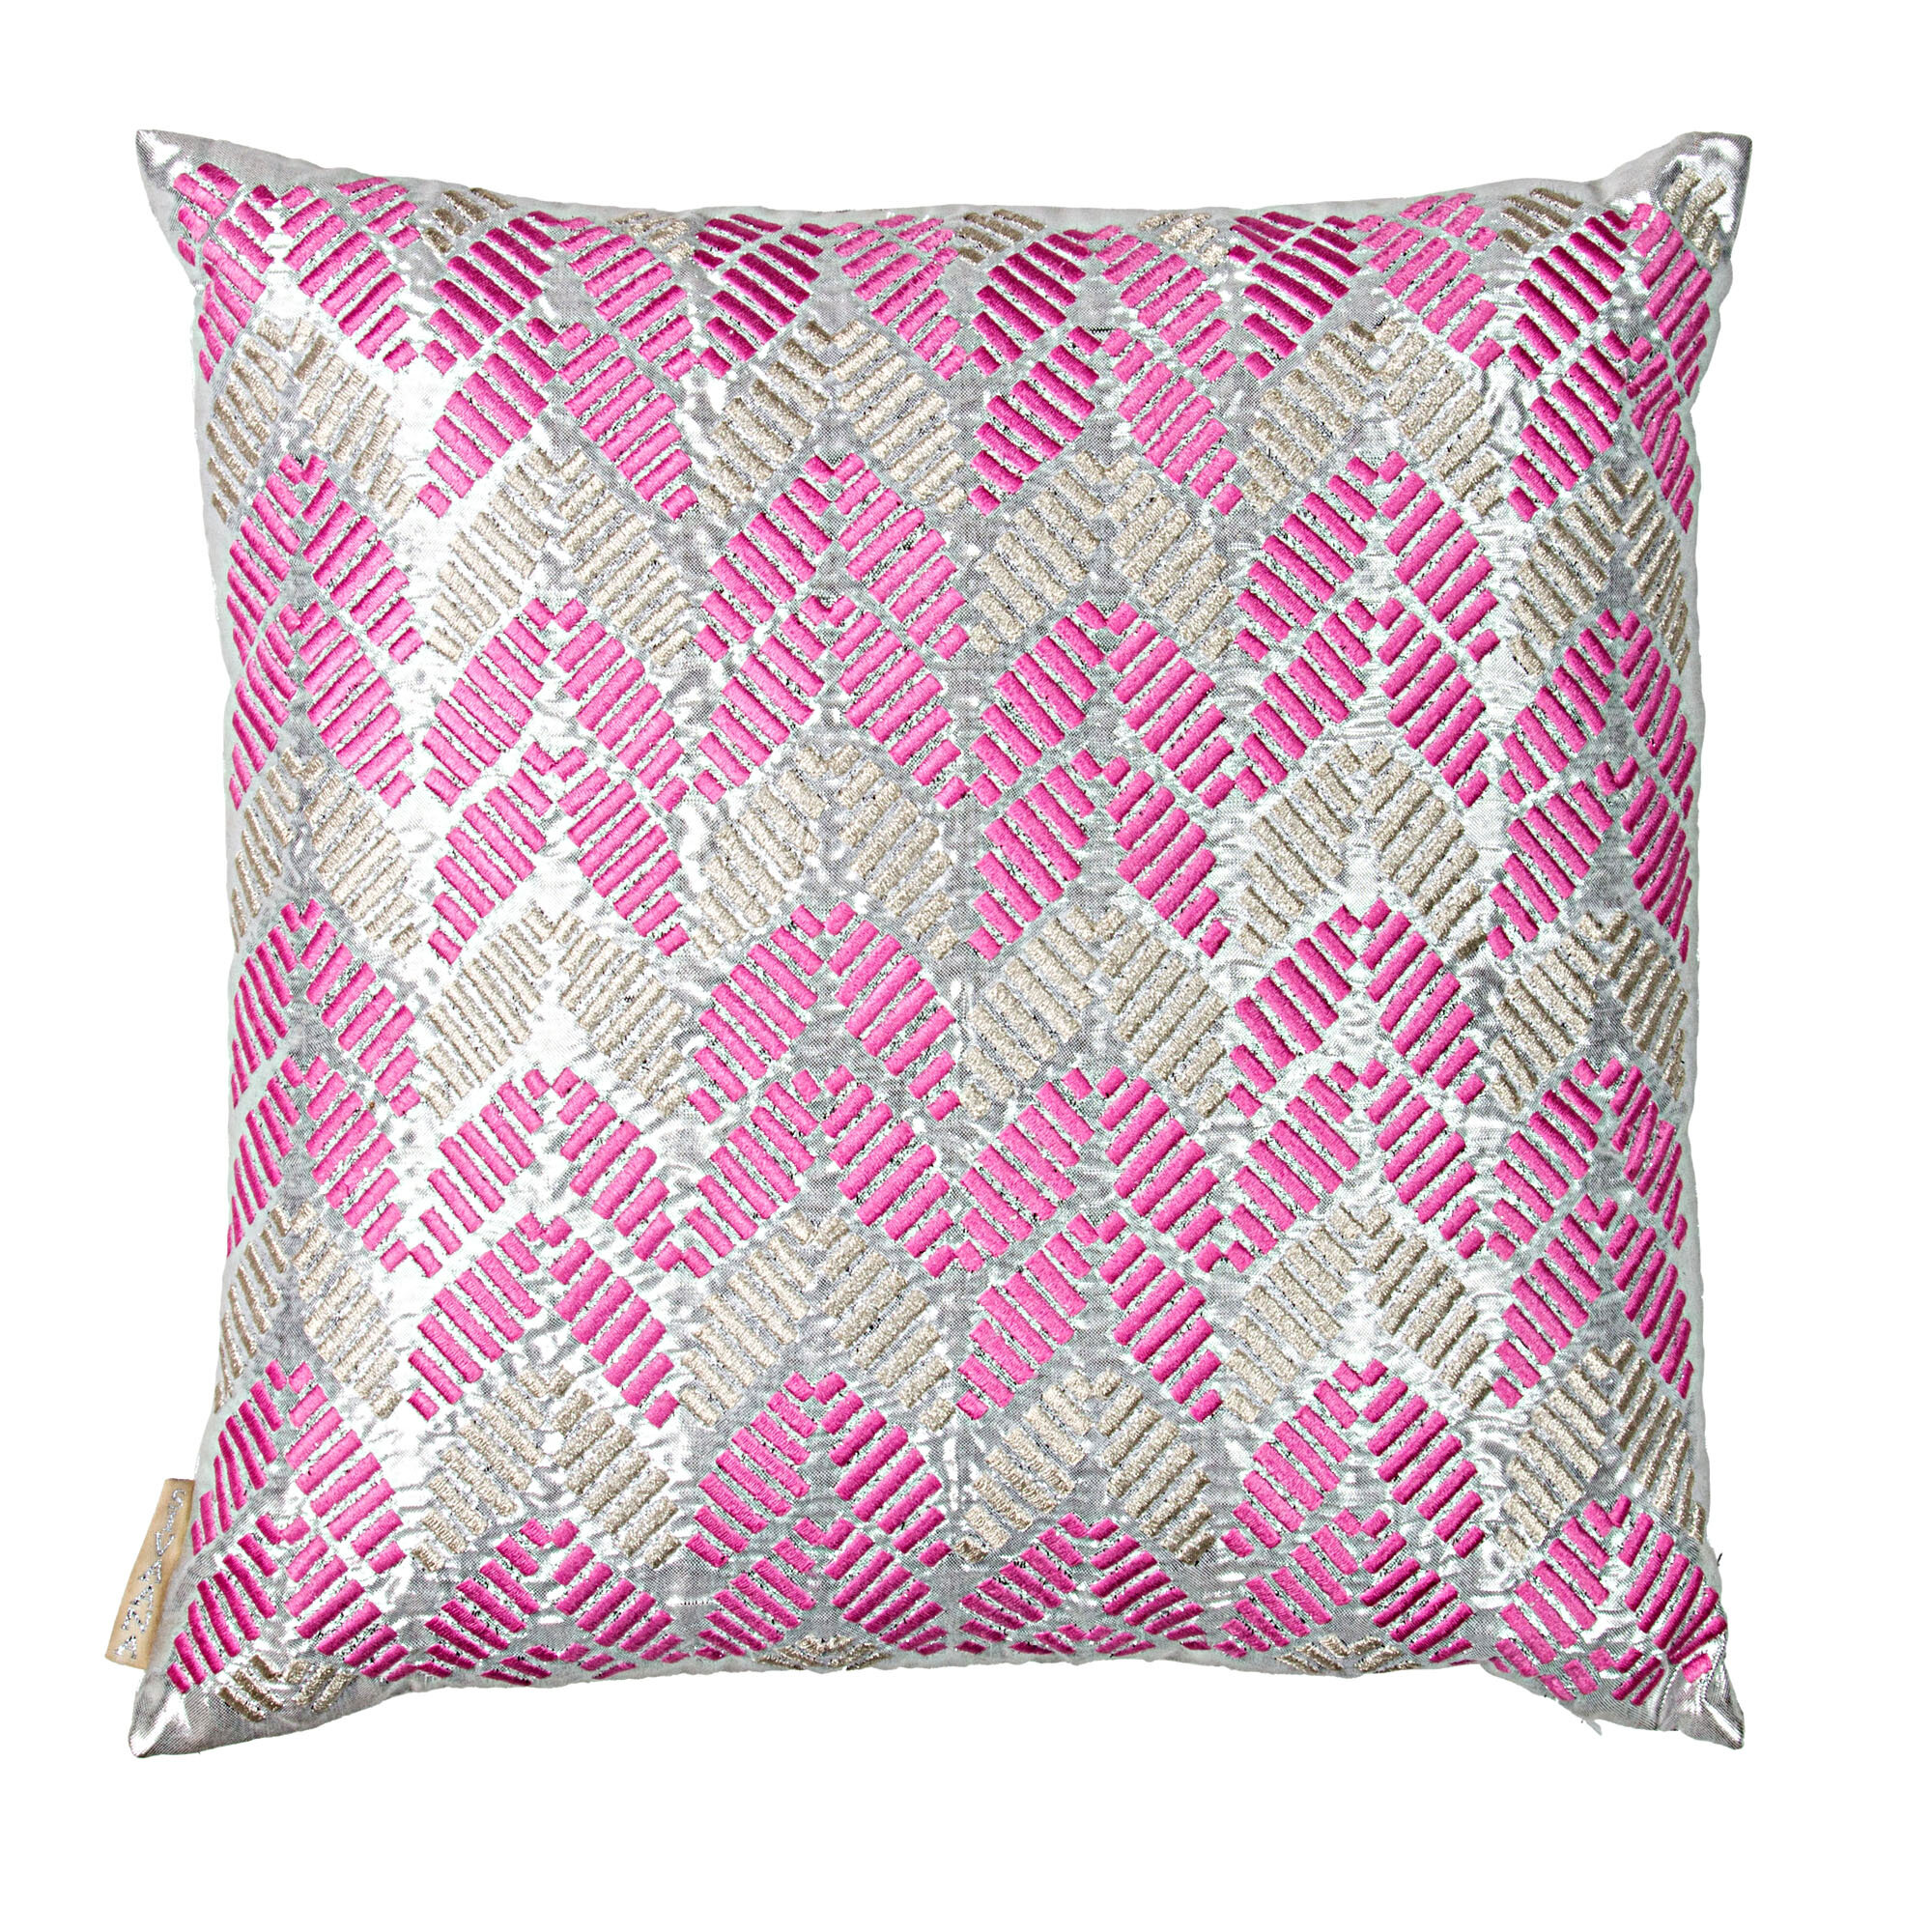 Sivaana Hand Embroidered Leaves Throw Pillow | Wayfair